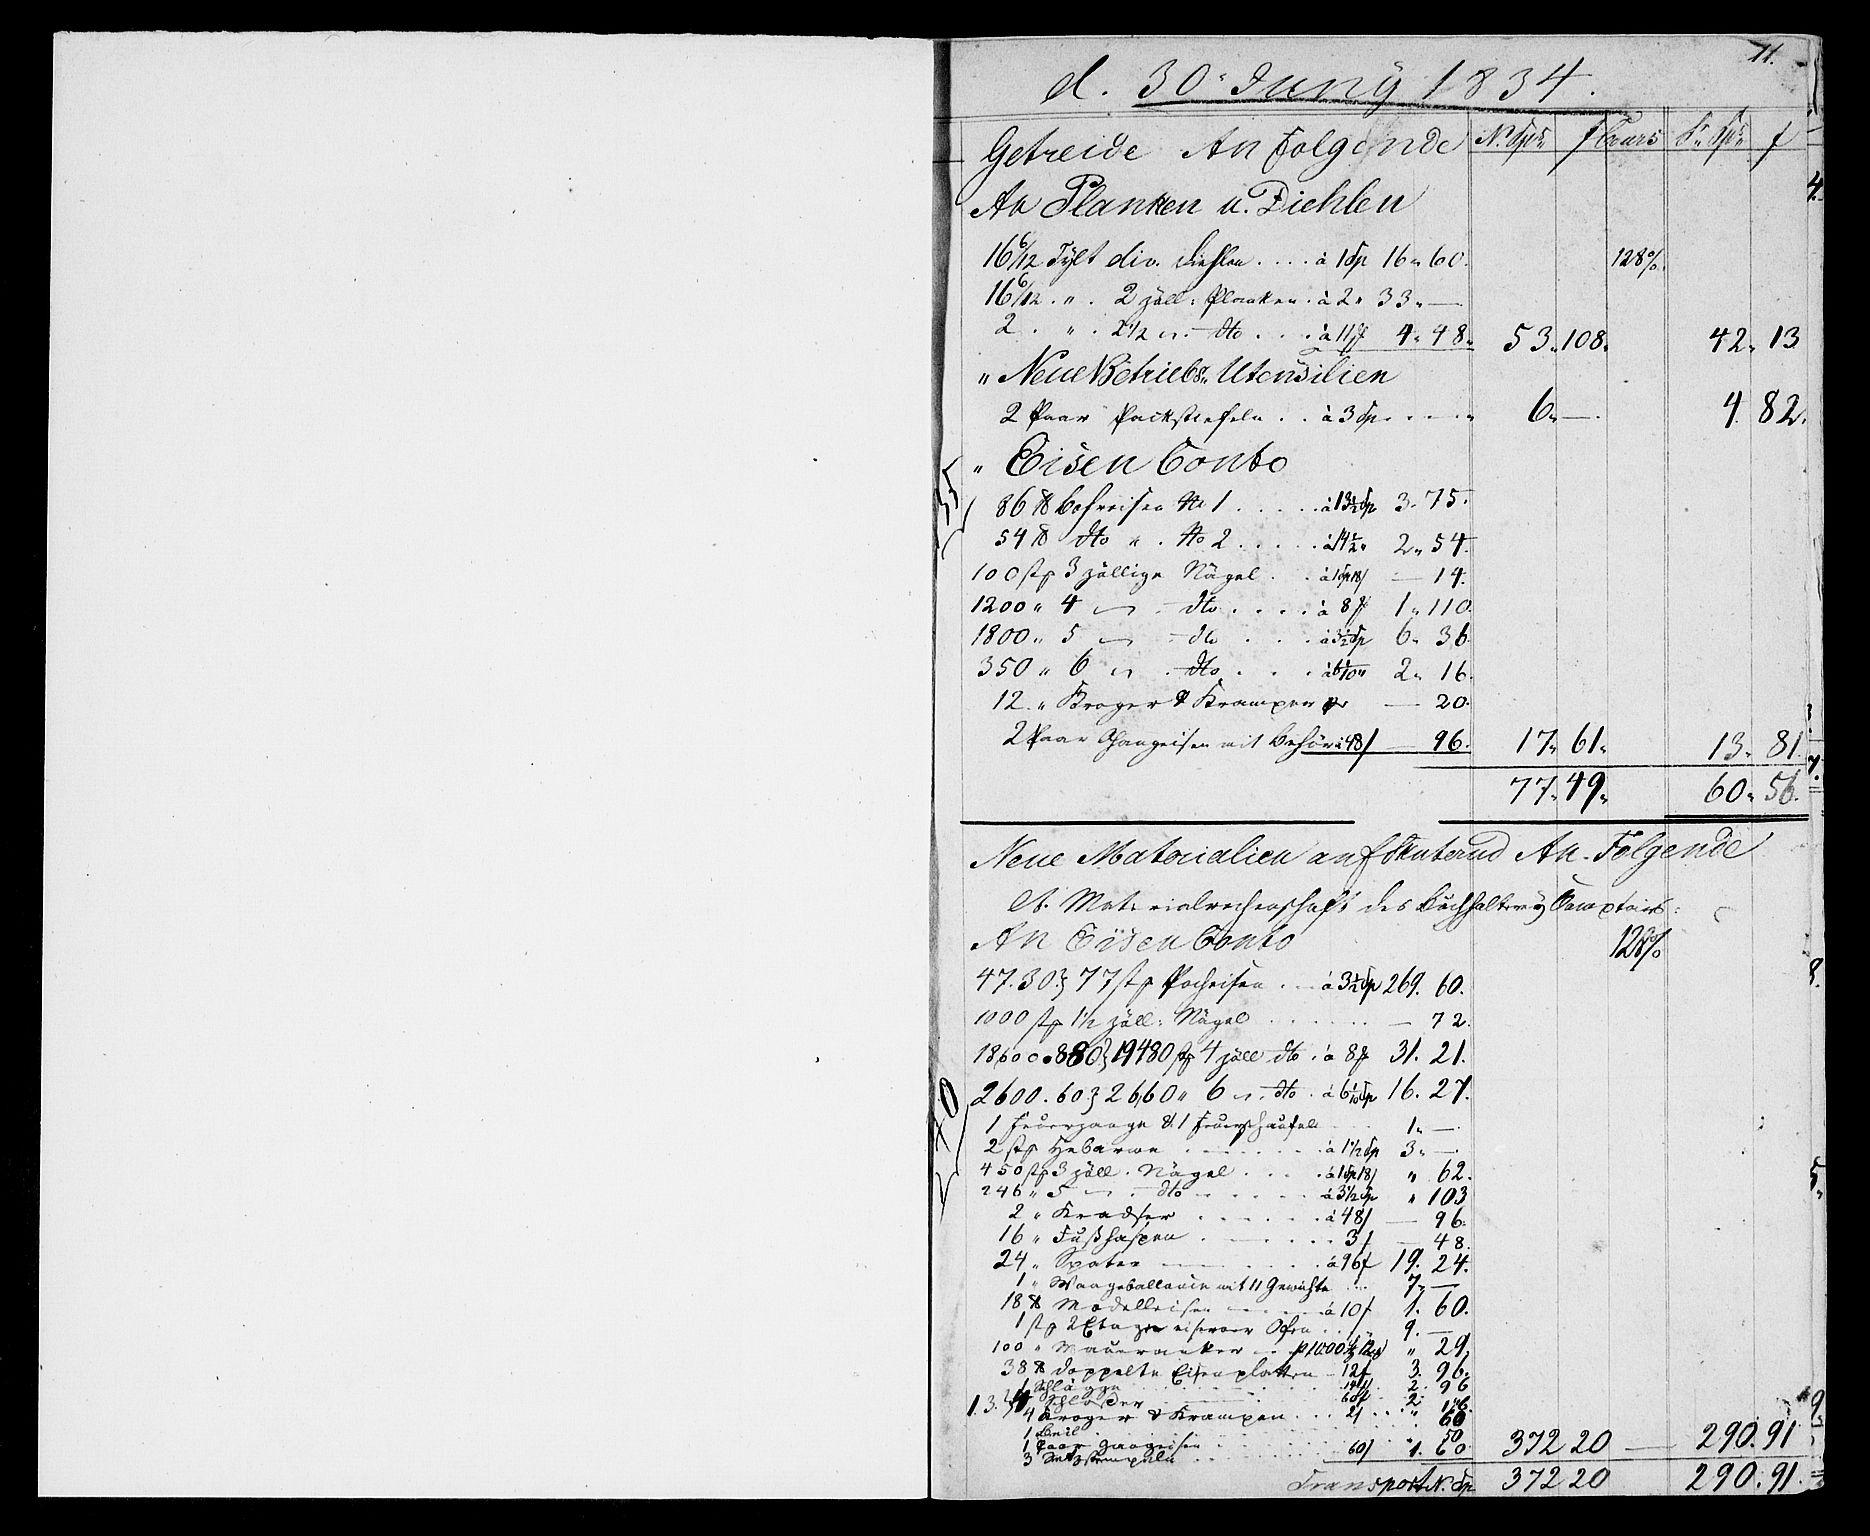 RA, Modums Blaafarveværk, G/Gd/Gda/L0171, 1834-1838, s. 2